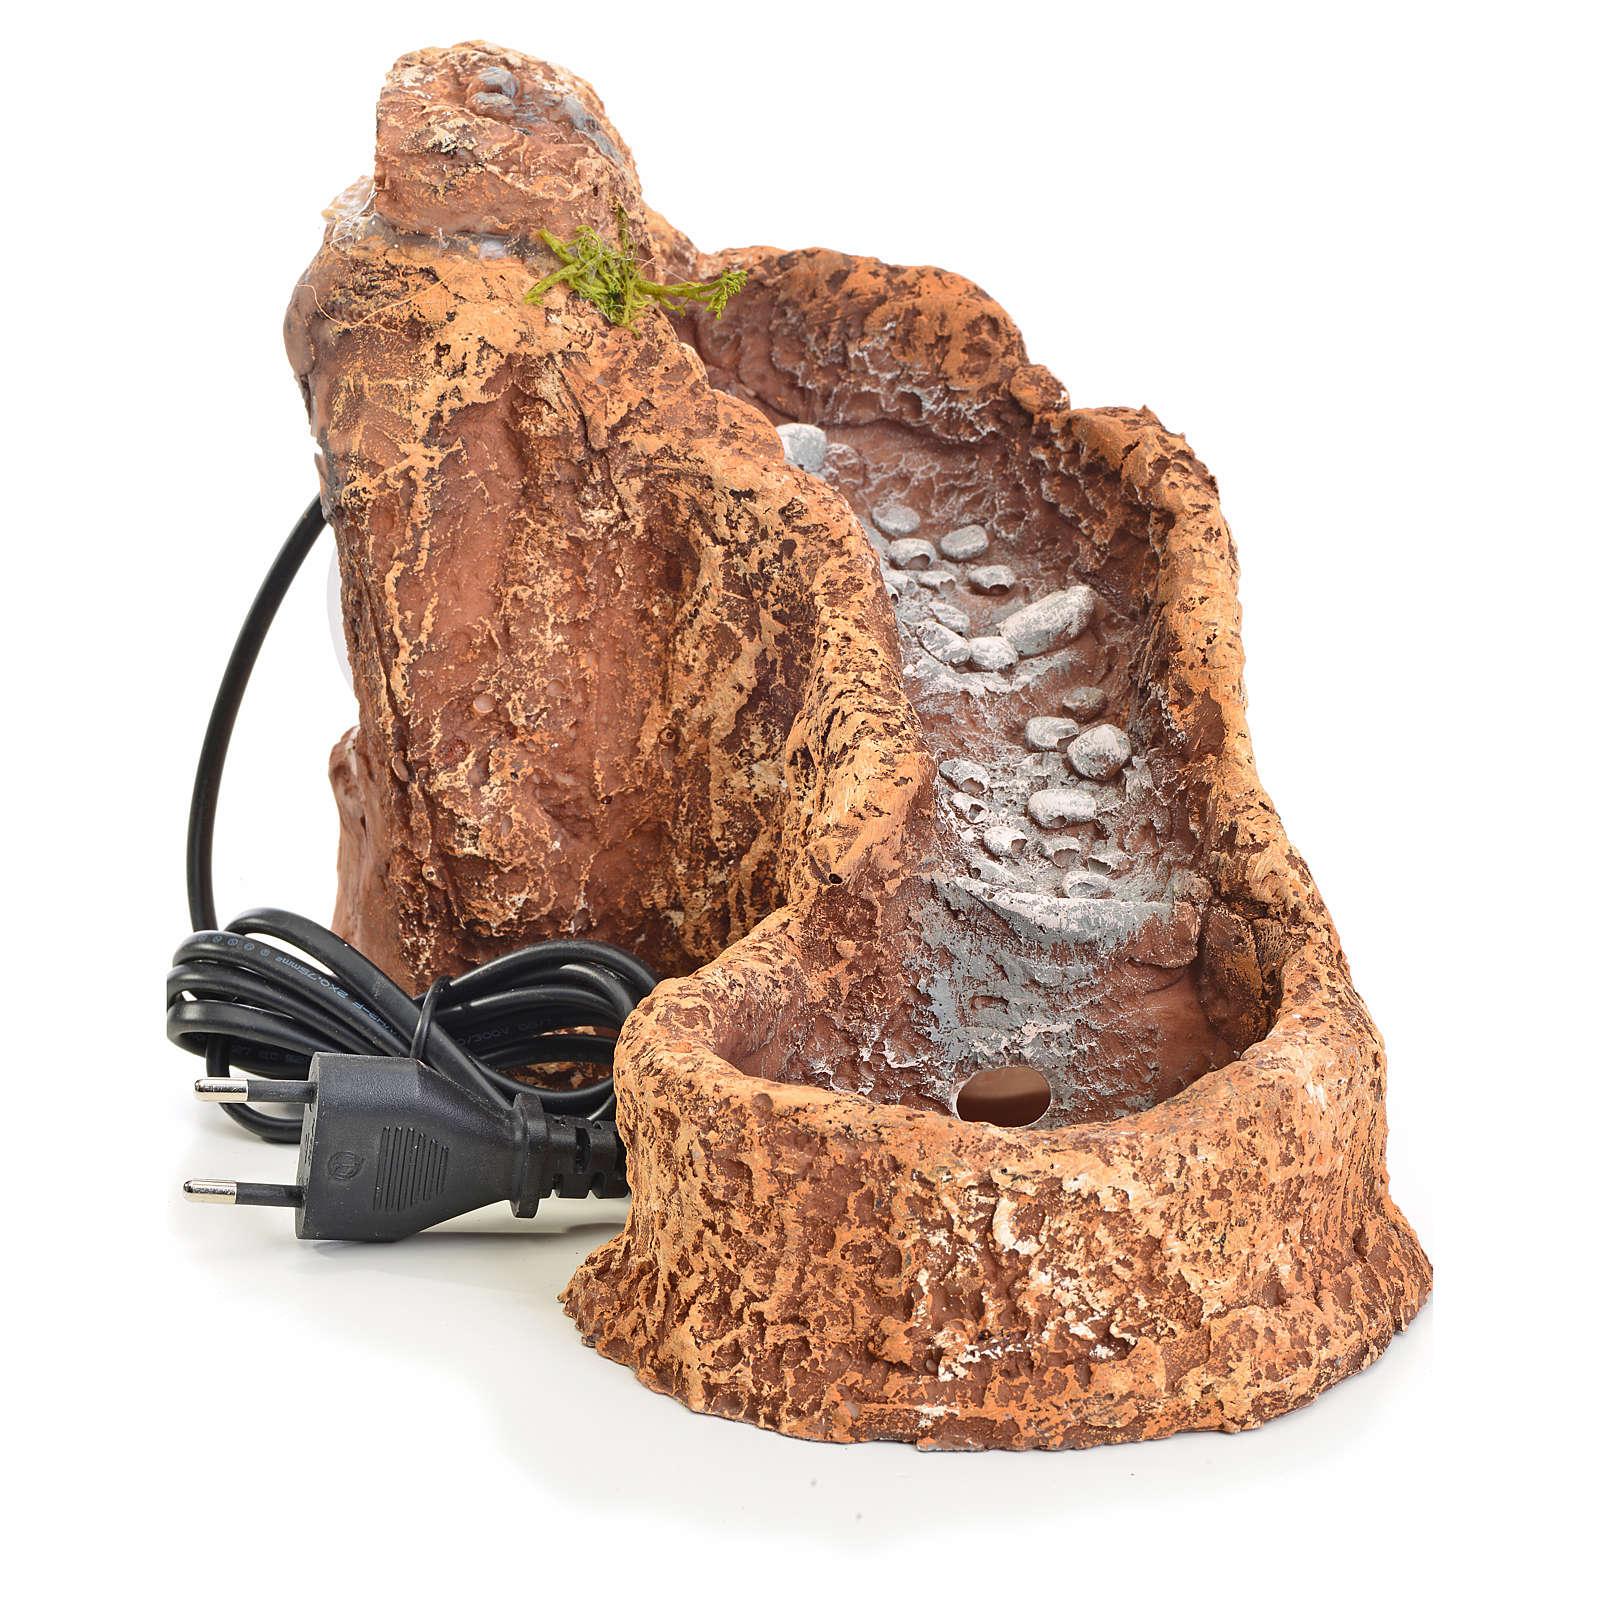 Riochuelo resina en curva para pesebre 18x15x27cm 4